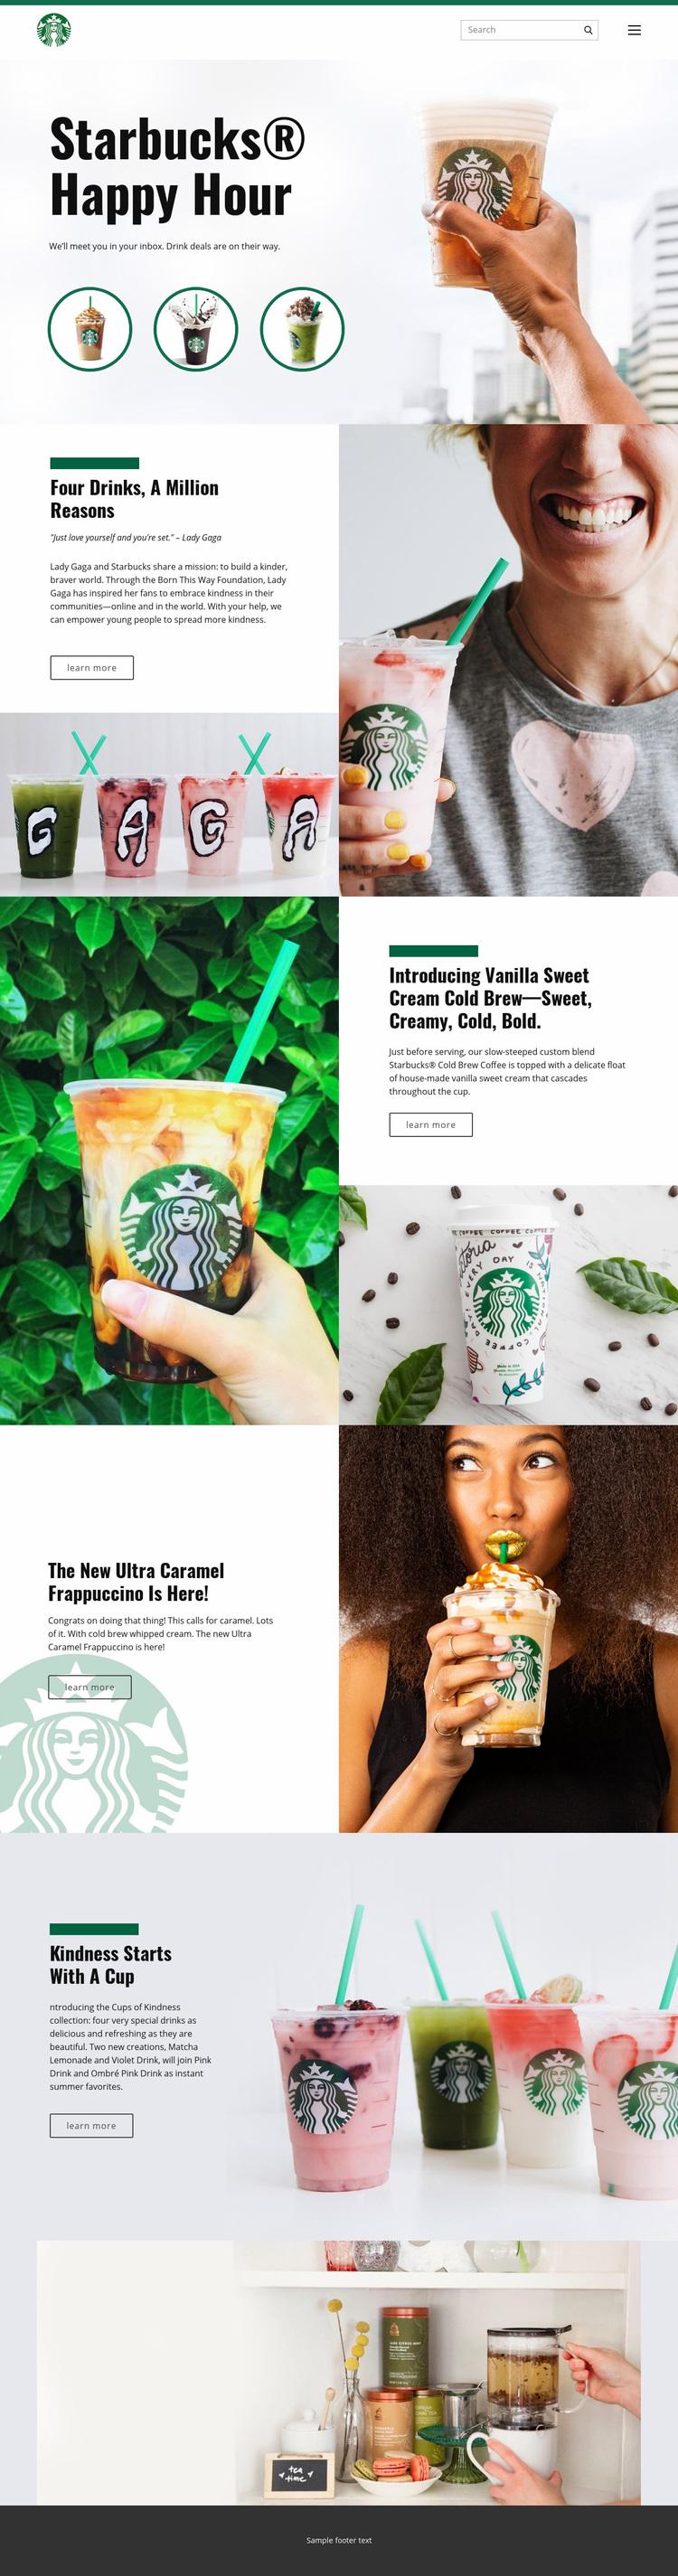 Starbucks Coffee Web Page Designer